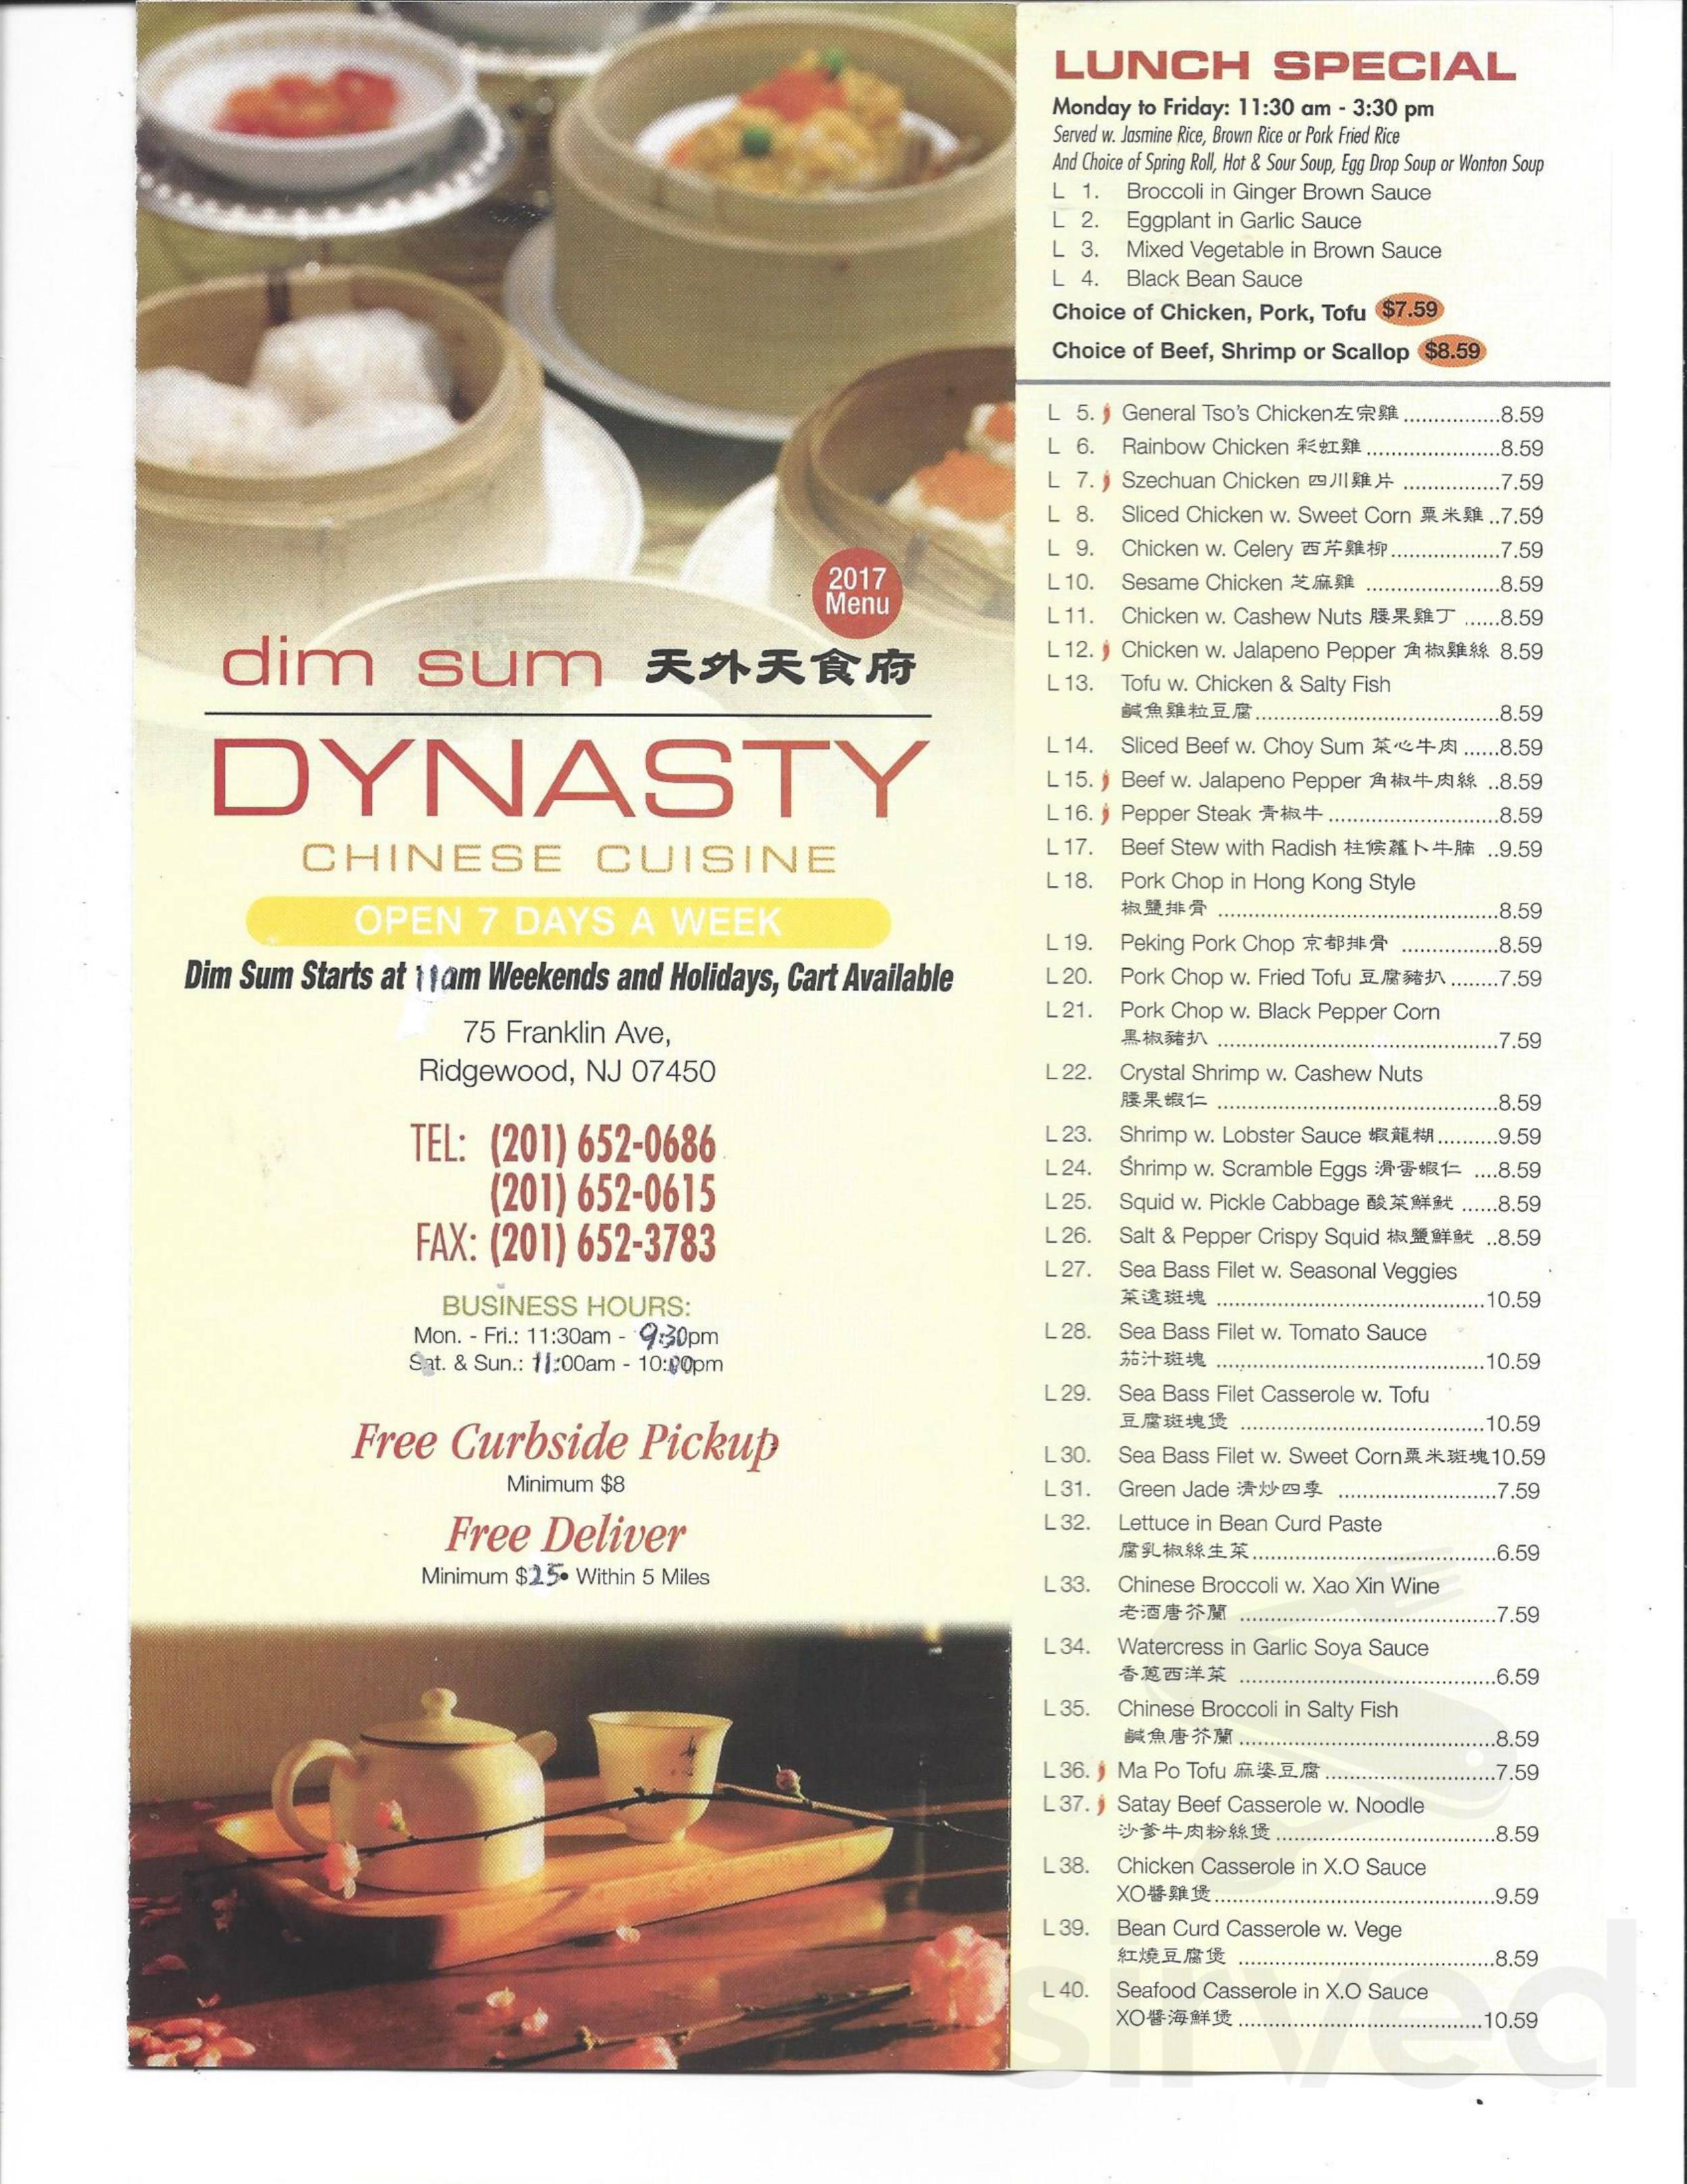 Dim Sum Dynasty menu in Ridgewood, New Jersey, USA